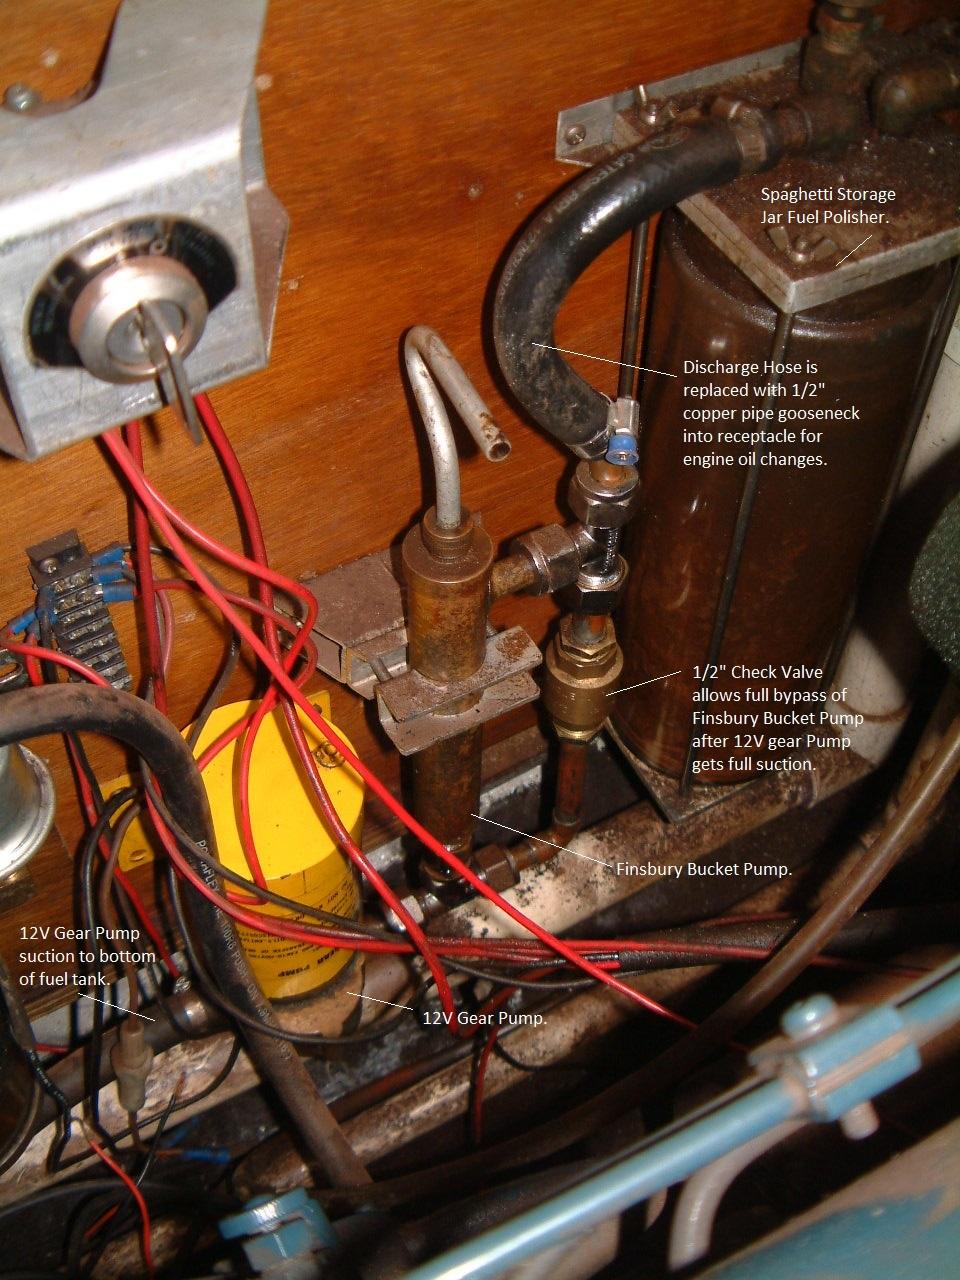 Click image for larger version  Name:General Arrangement of Fuel Polisher.jpg Views:91 Size:385.7 KB ID:64924